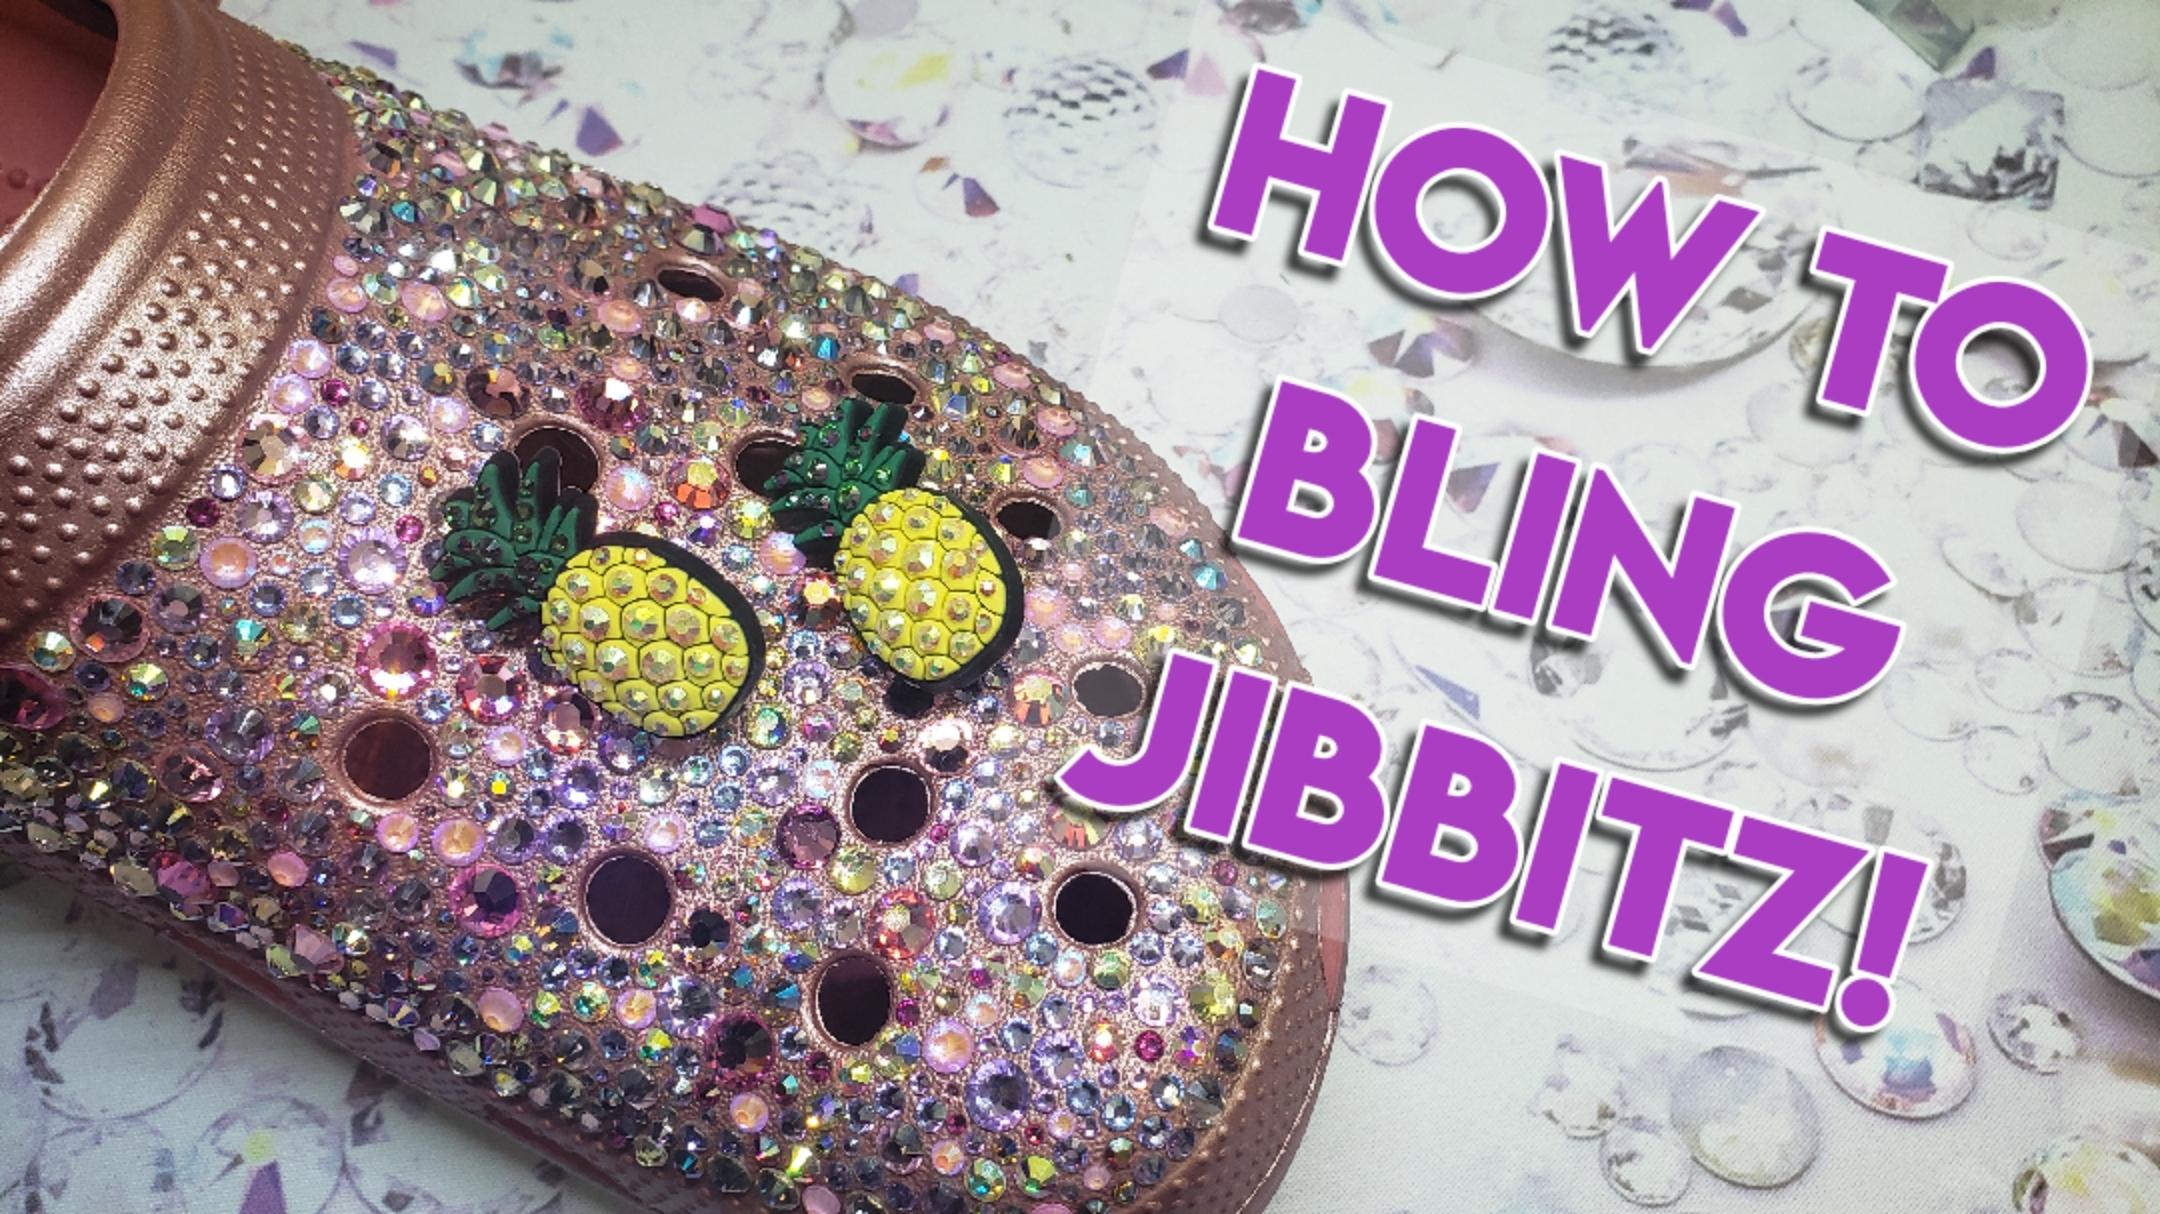 How to bling Jibbitz